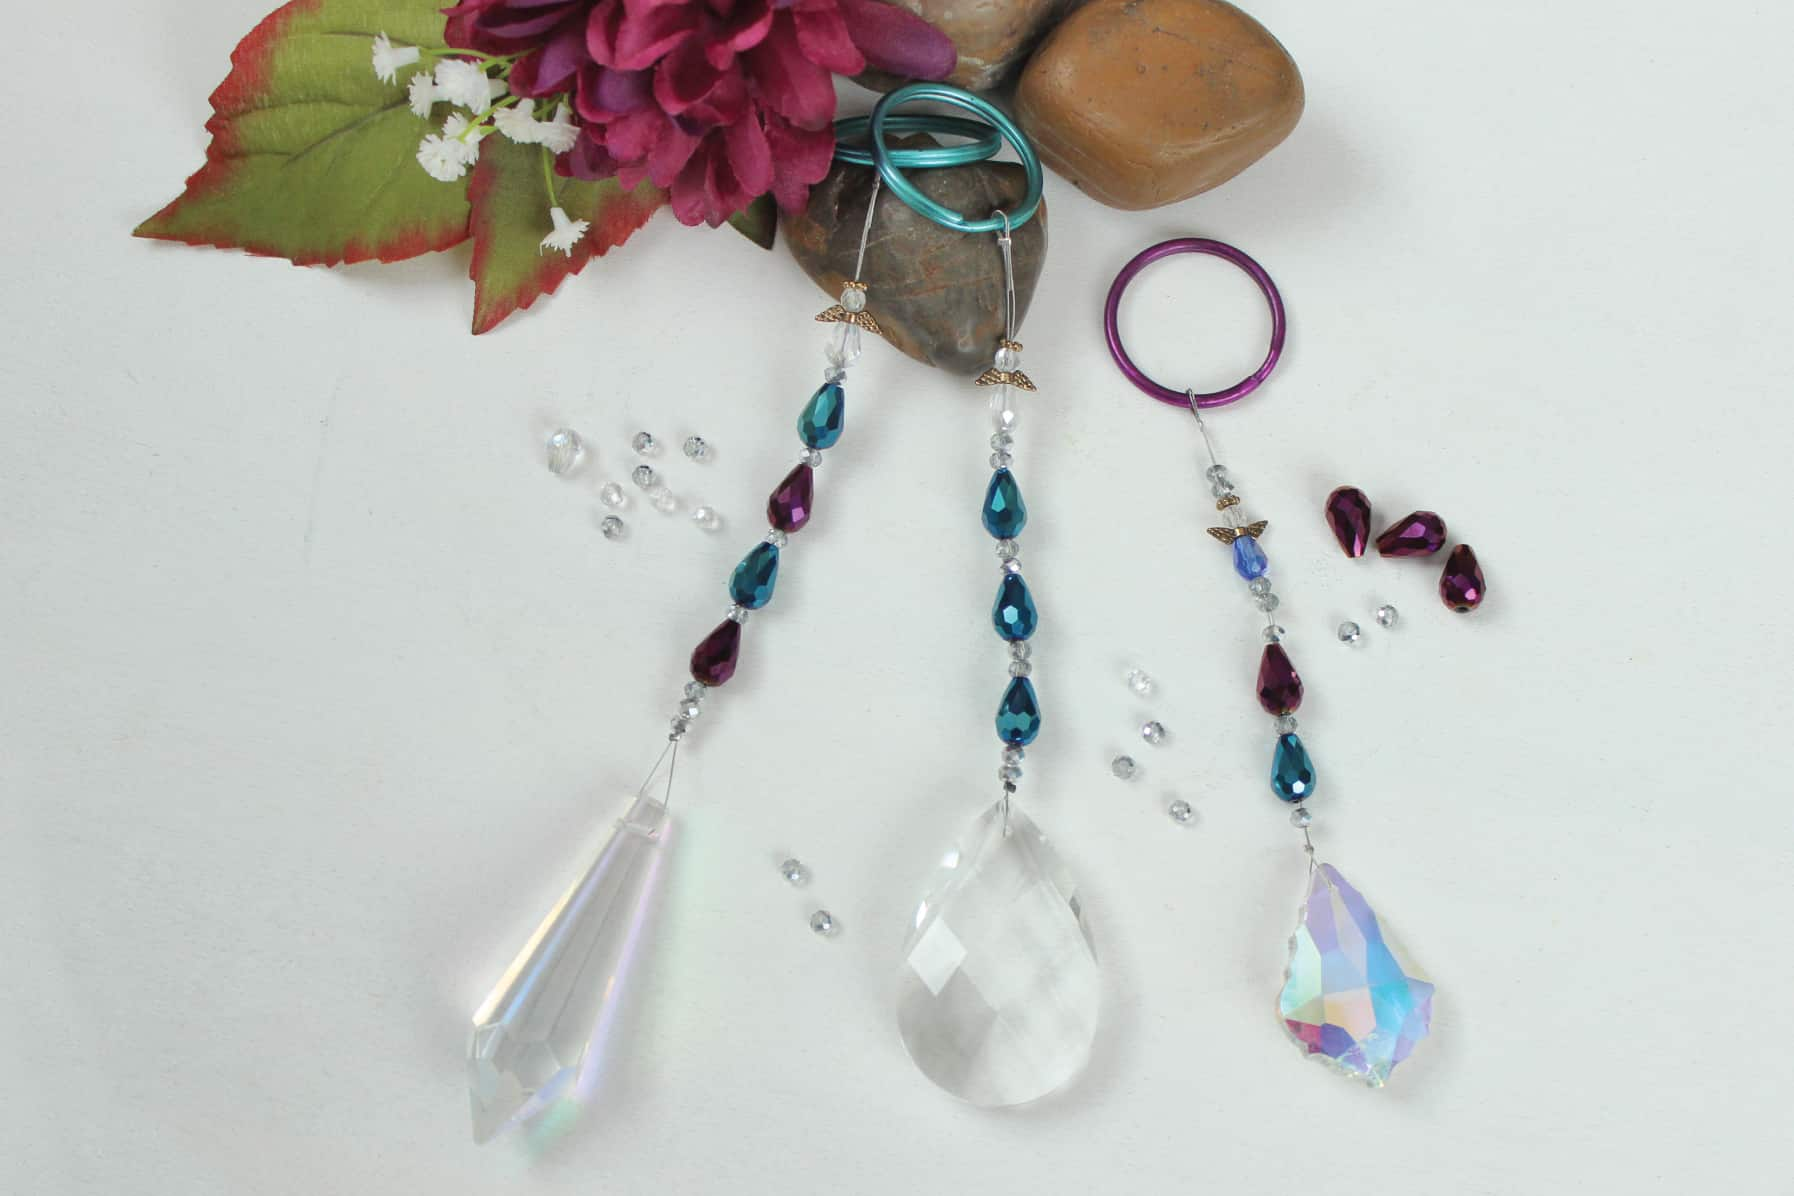 Raindrop crystal suncatchers